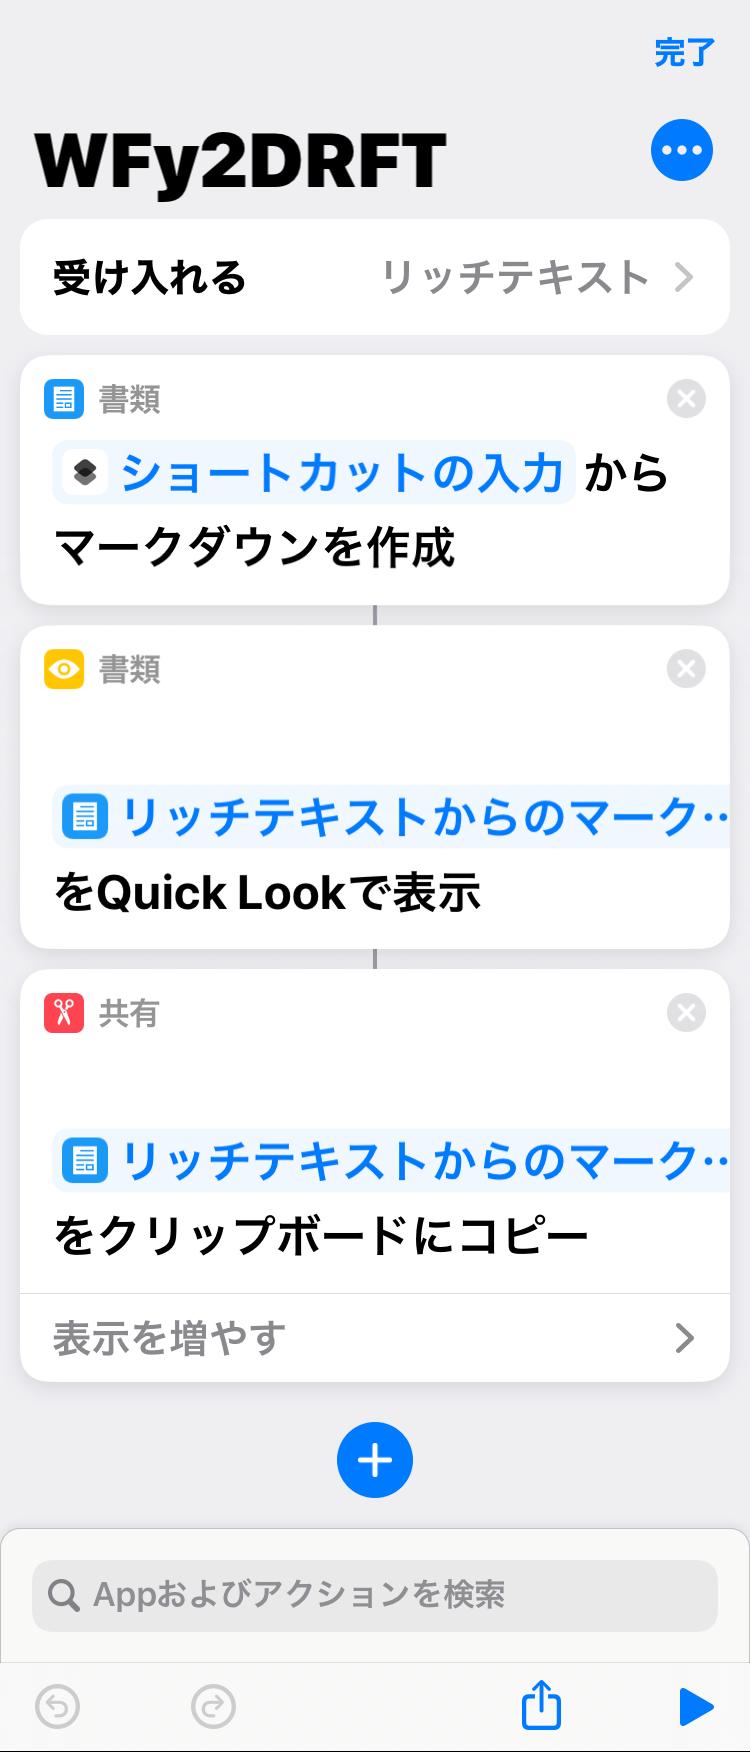 f:id:sorashima:20200815151403p:plain:w311